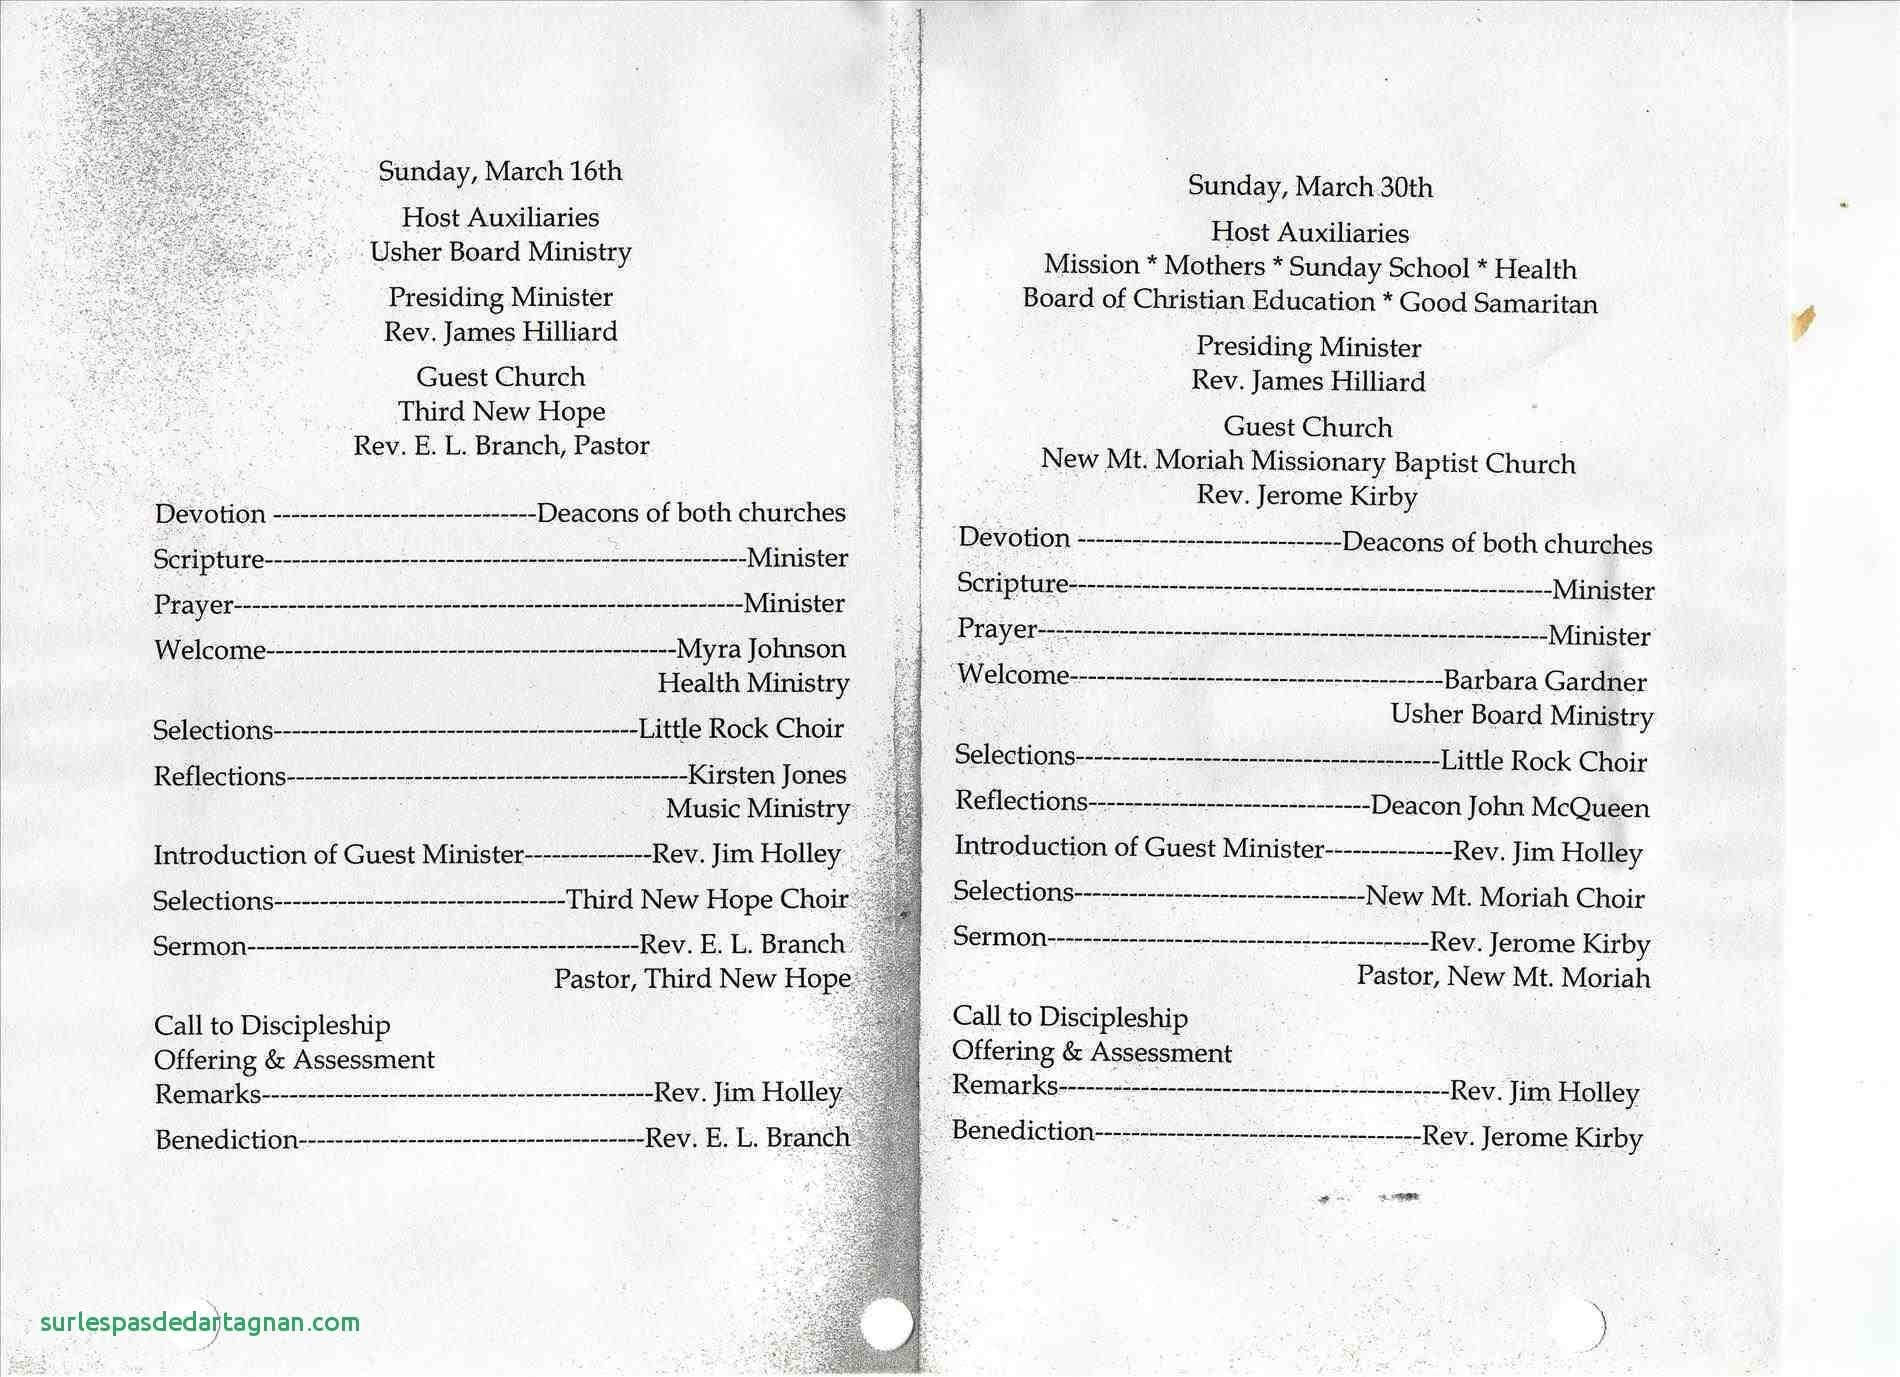 Free Church Templates Microsoft Word - The Best Church Flyer Inside Church Program Templates Word